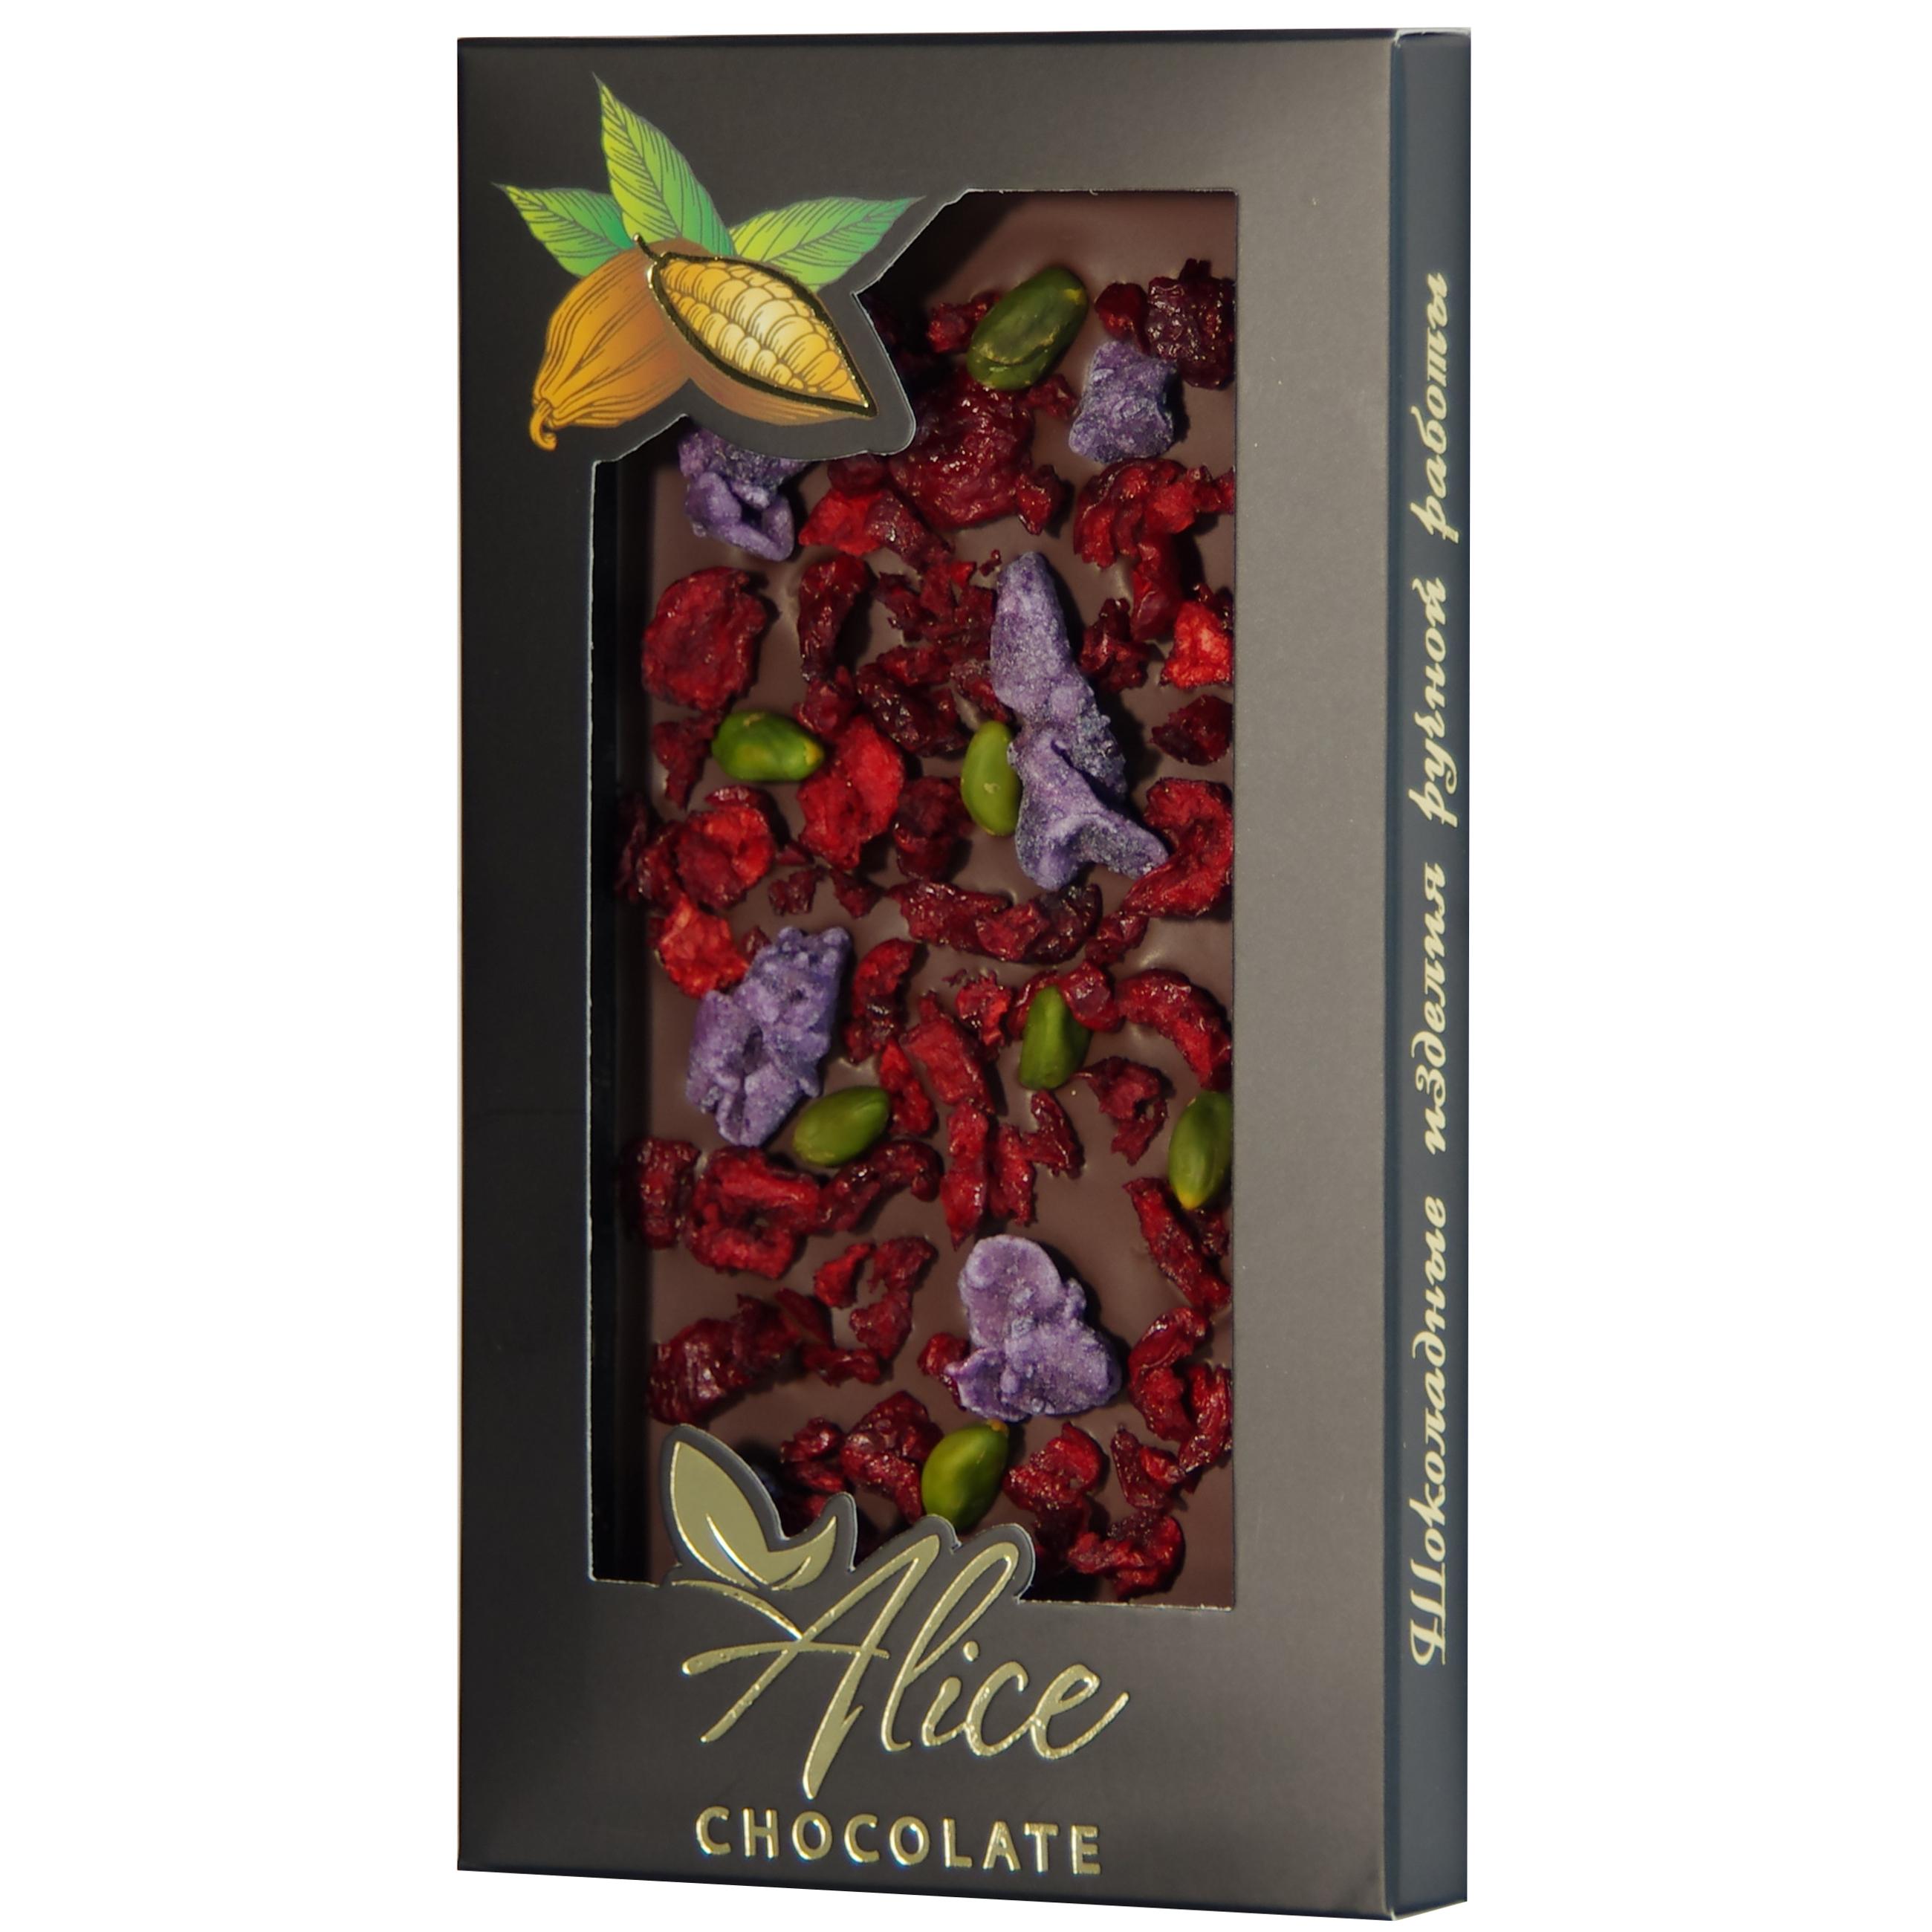 http://alice-chocolate.ru/wp-content/uploads/2018/05/Temnyj-s-fialkoj-vishnej-i-fistashkoj.jpg